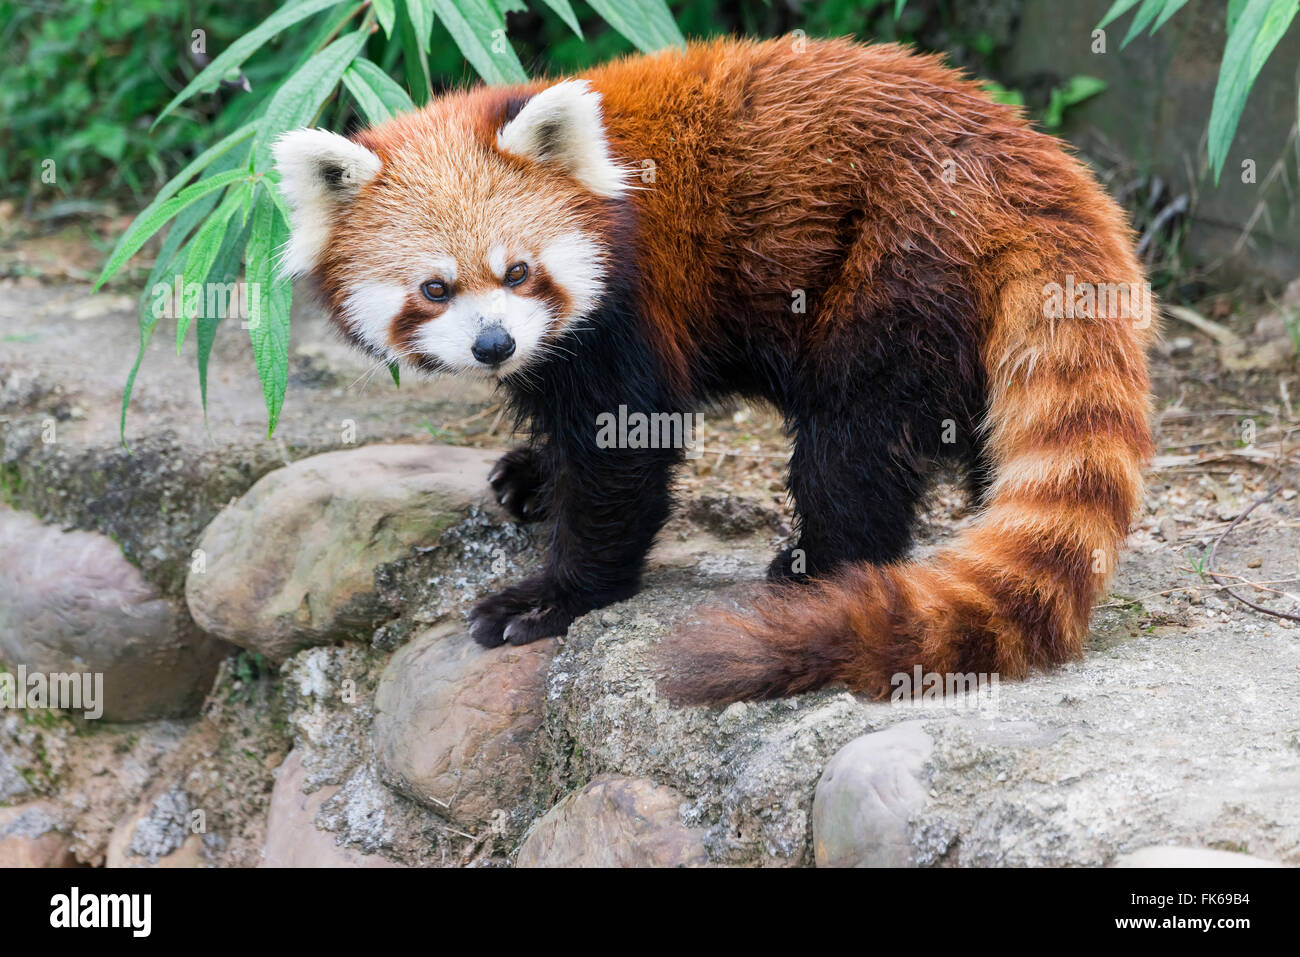 Red Panda (Ailurus fulgens), Sichuan Province, China, Asia Stock Photo